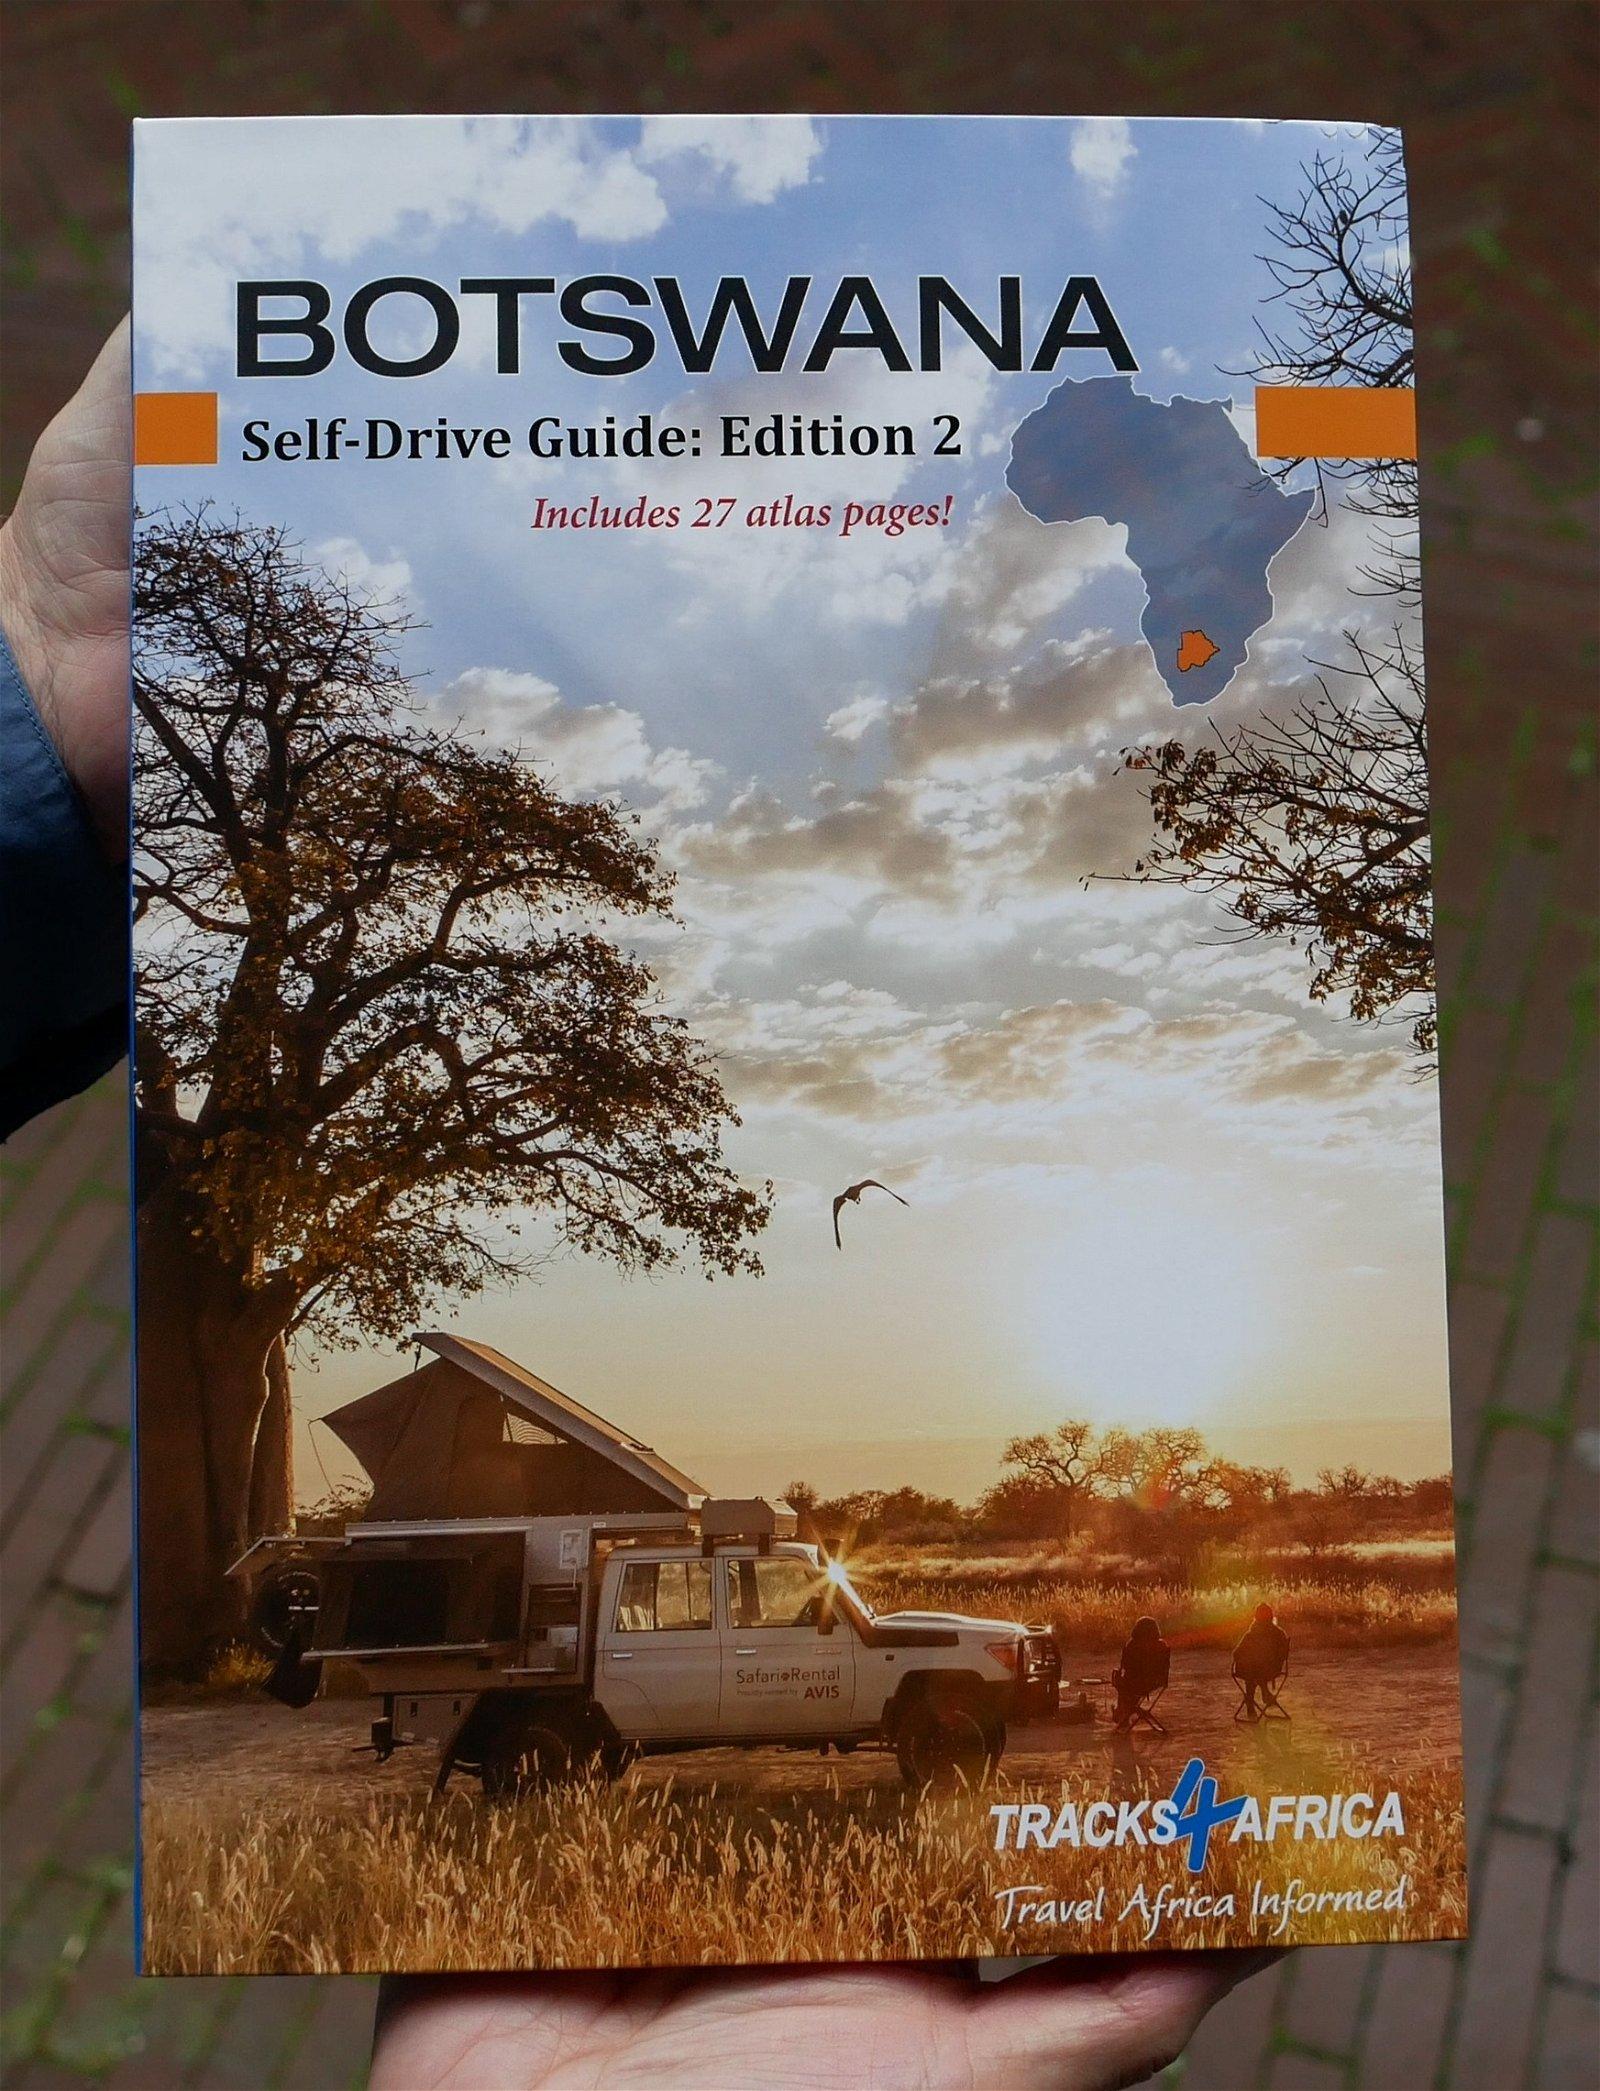 Botswana Self-Drive Guide tracks 9780992183042  Tracks4Africa   Reisgidsen, Wegenatlassen Botswana, Namibië